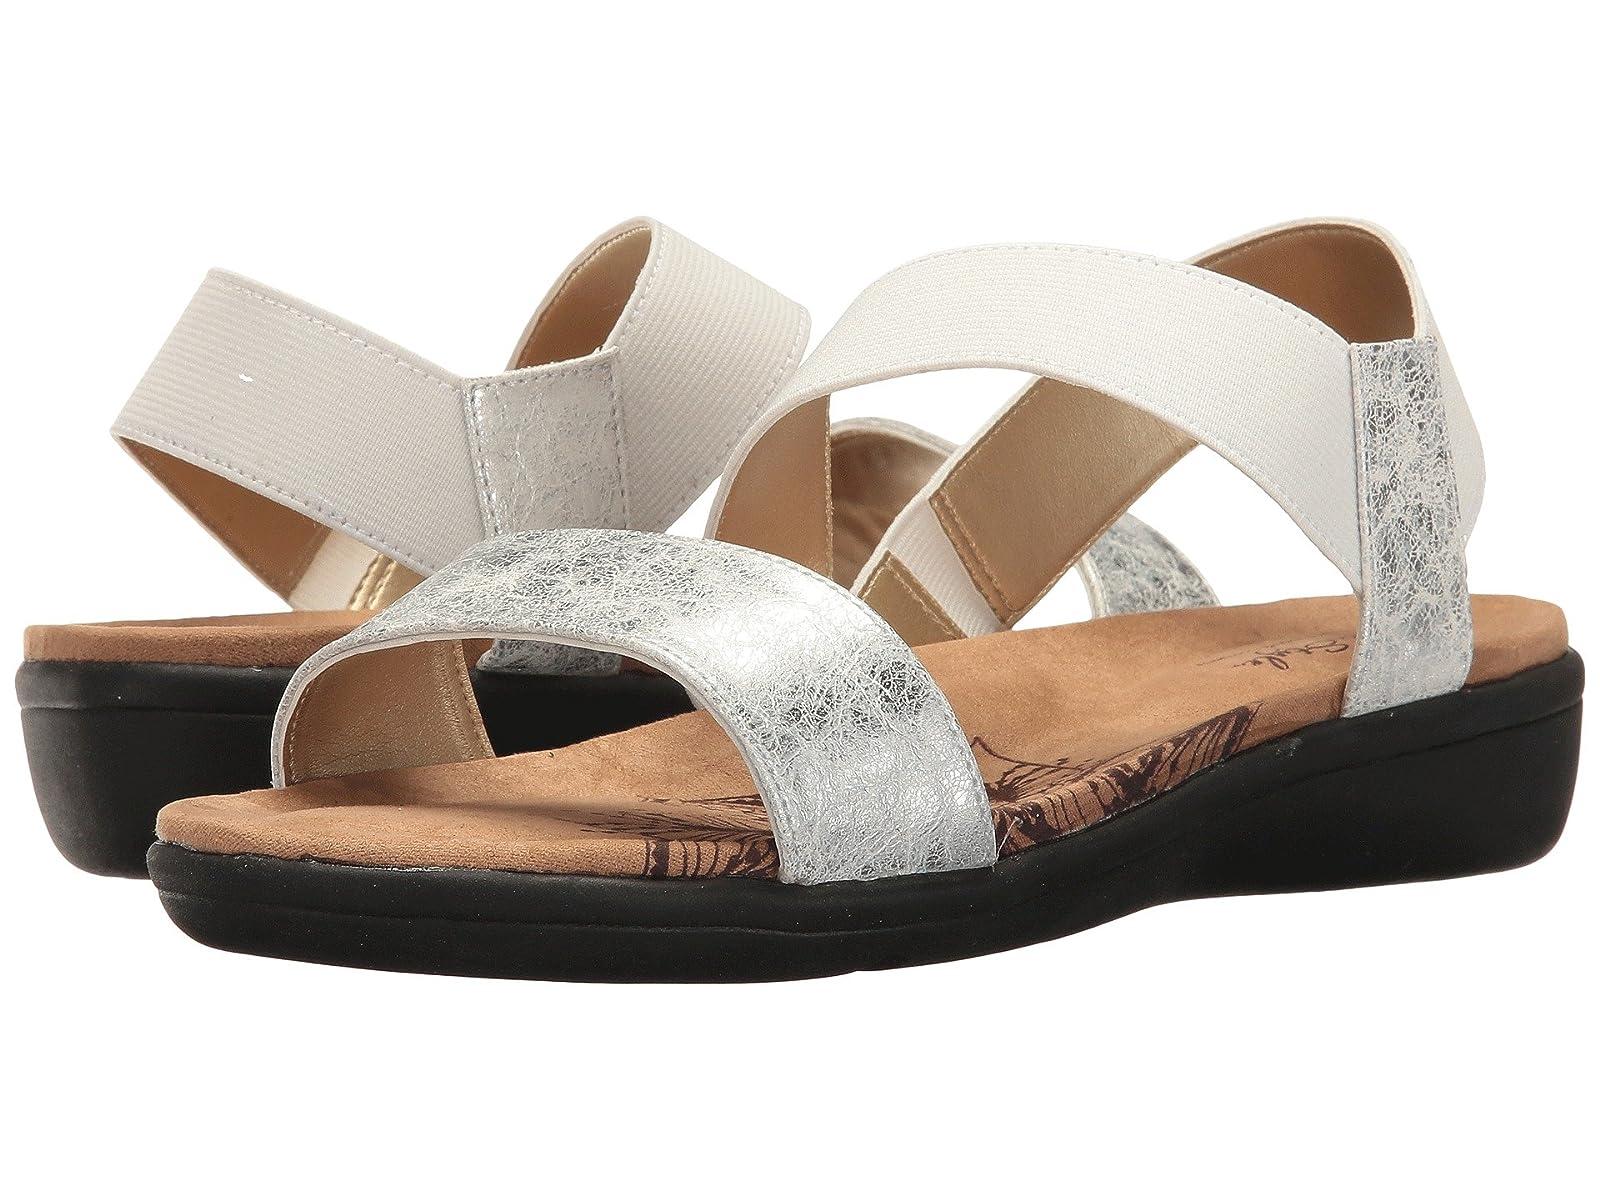 Soft Style PremaAtmospheric grades have affordable shoes